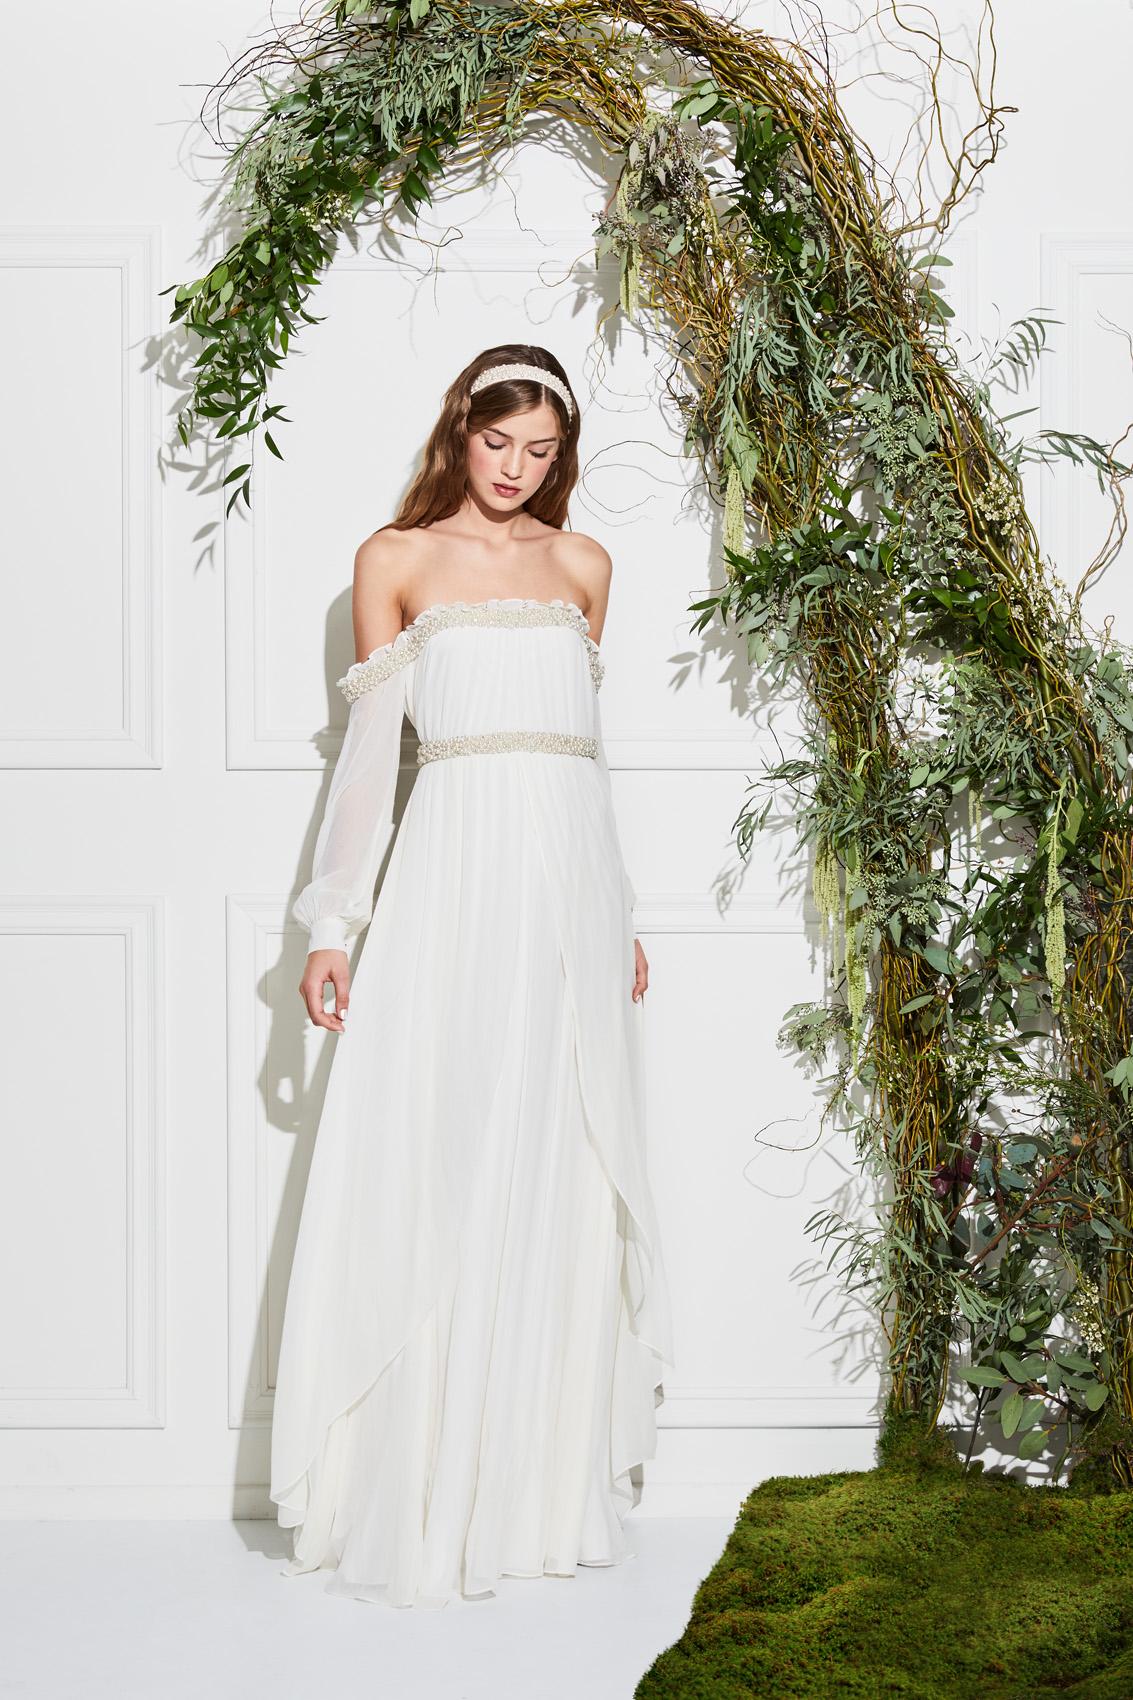 Rachel Zoe Is Launching Bridal Ahead of 20th Anniversary